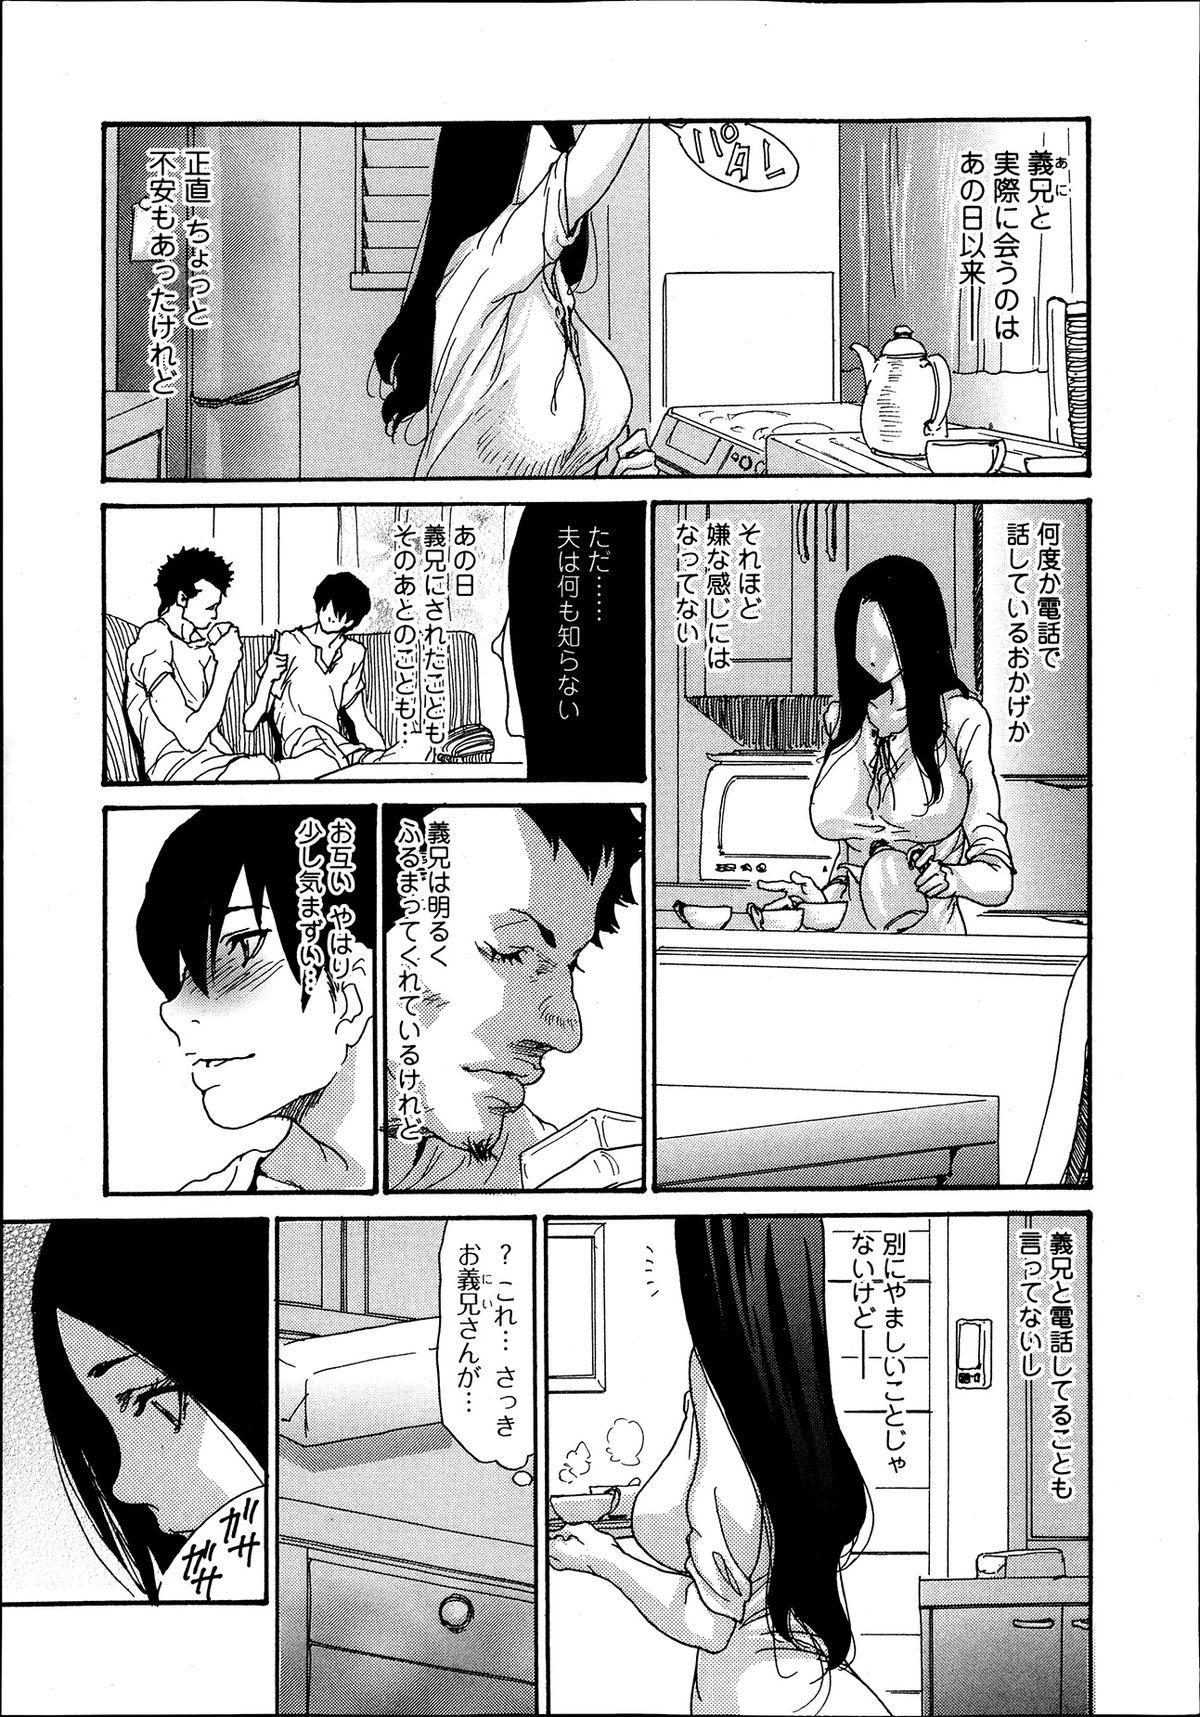 Bishoujo Kakumei KIWAME Road Vol.9 228